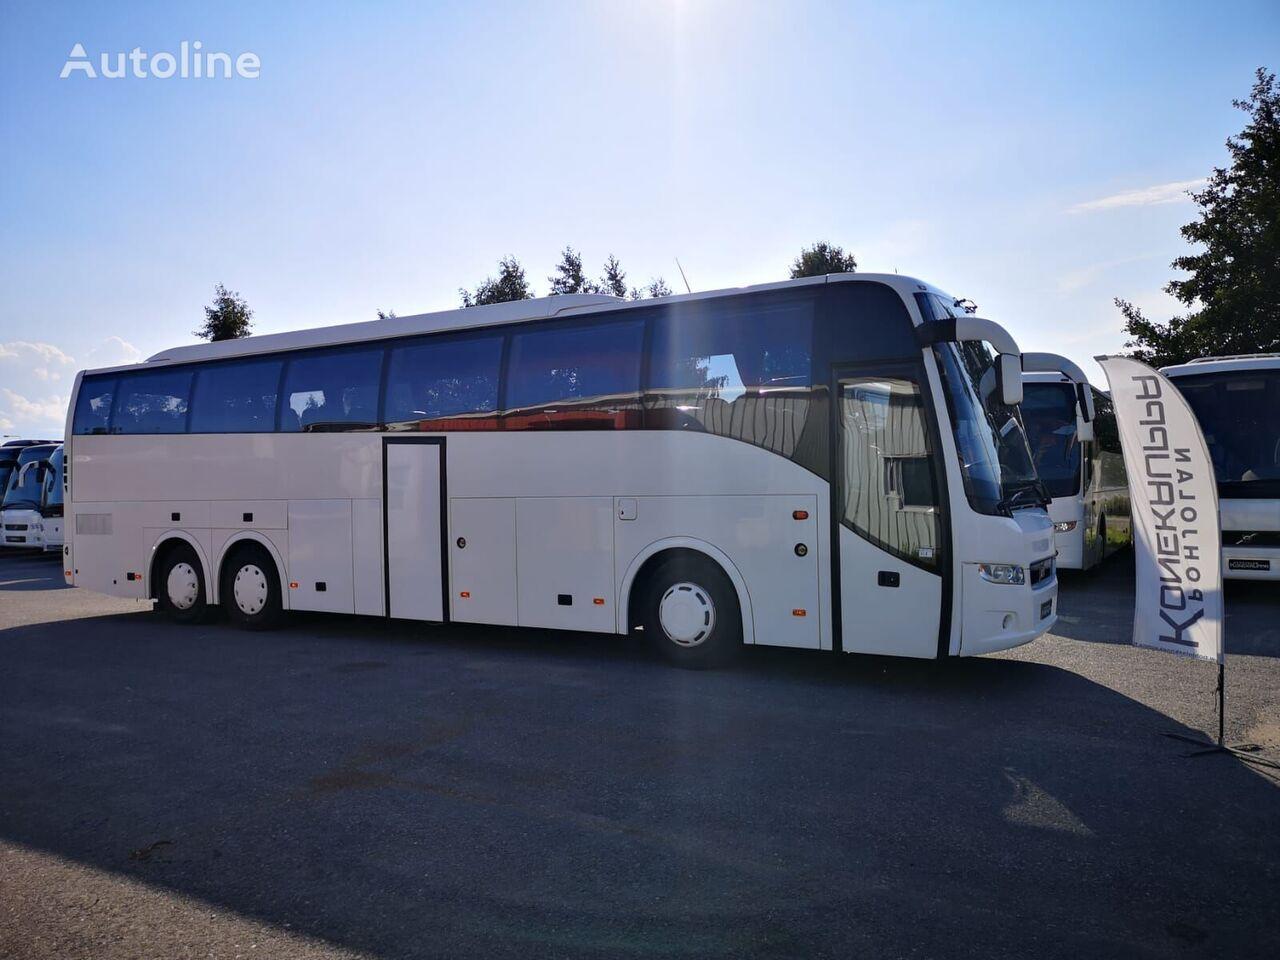 VOLVO 9900 B12B coach bus